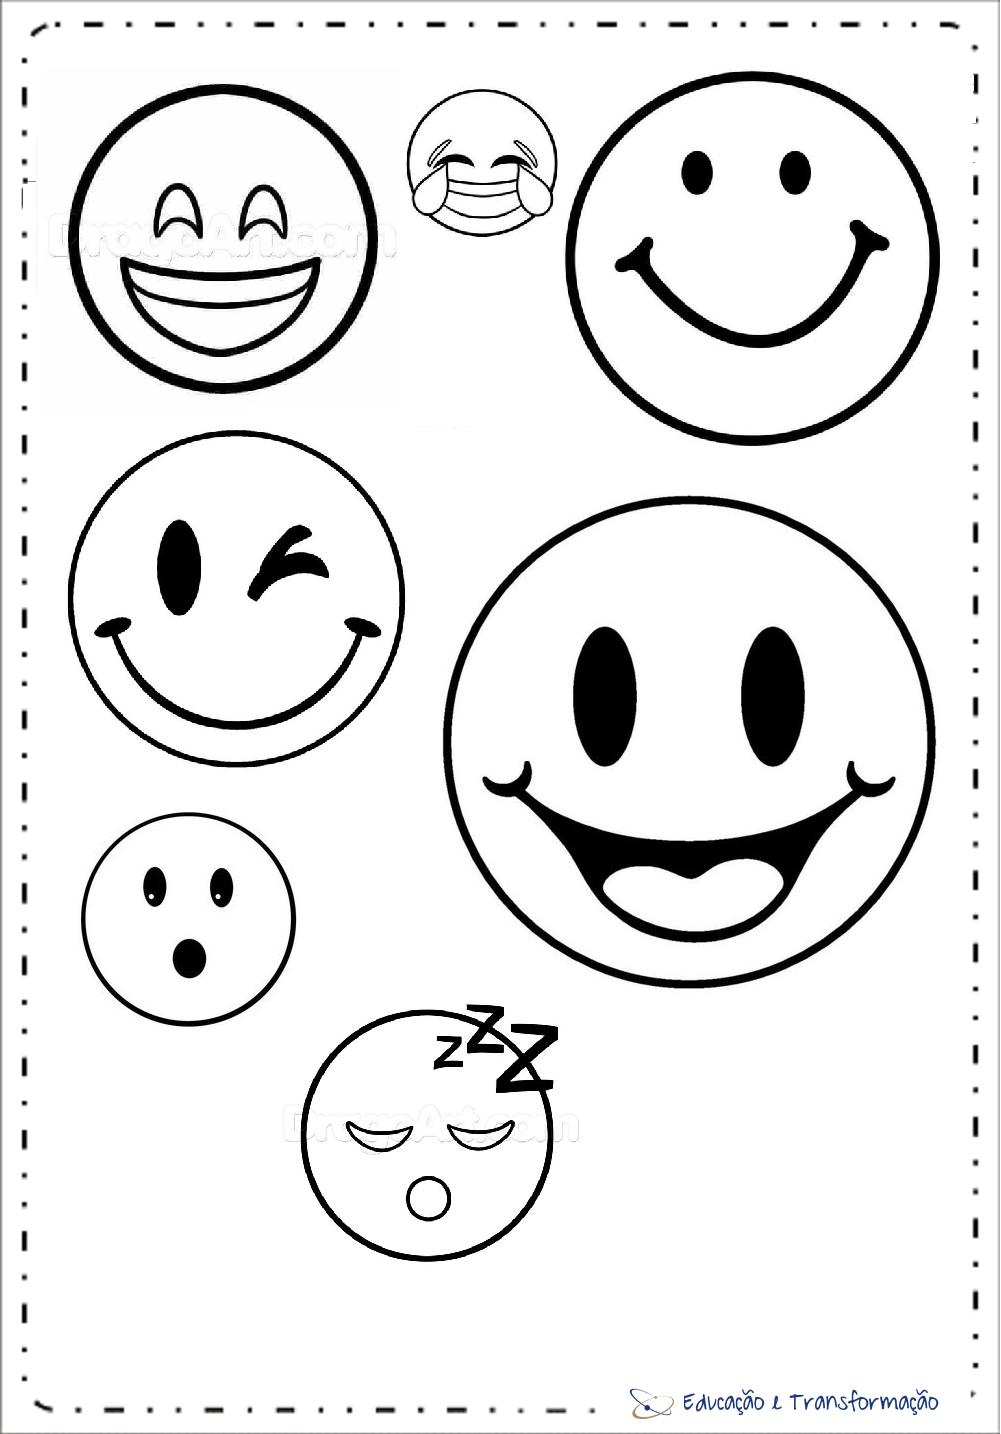 Moldes De Emoji Para Imprimir Eva E Feltro Artesanato E Decoracao